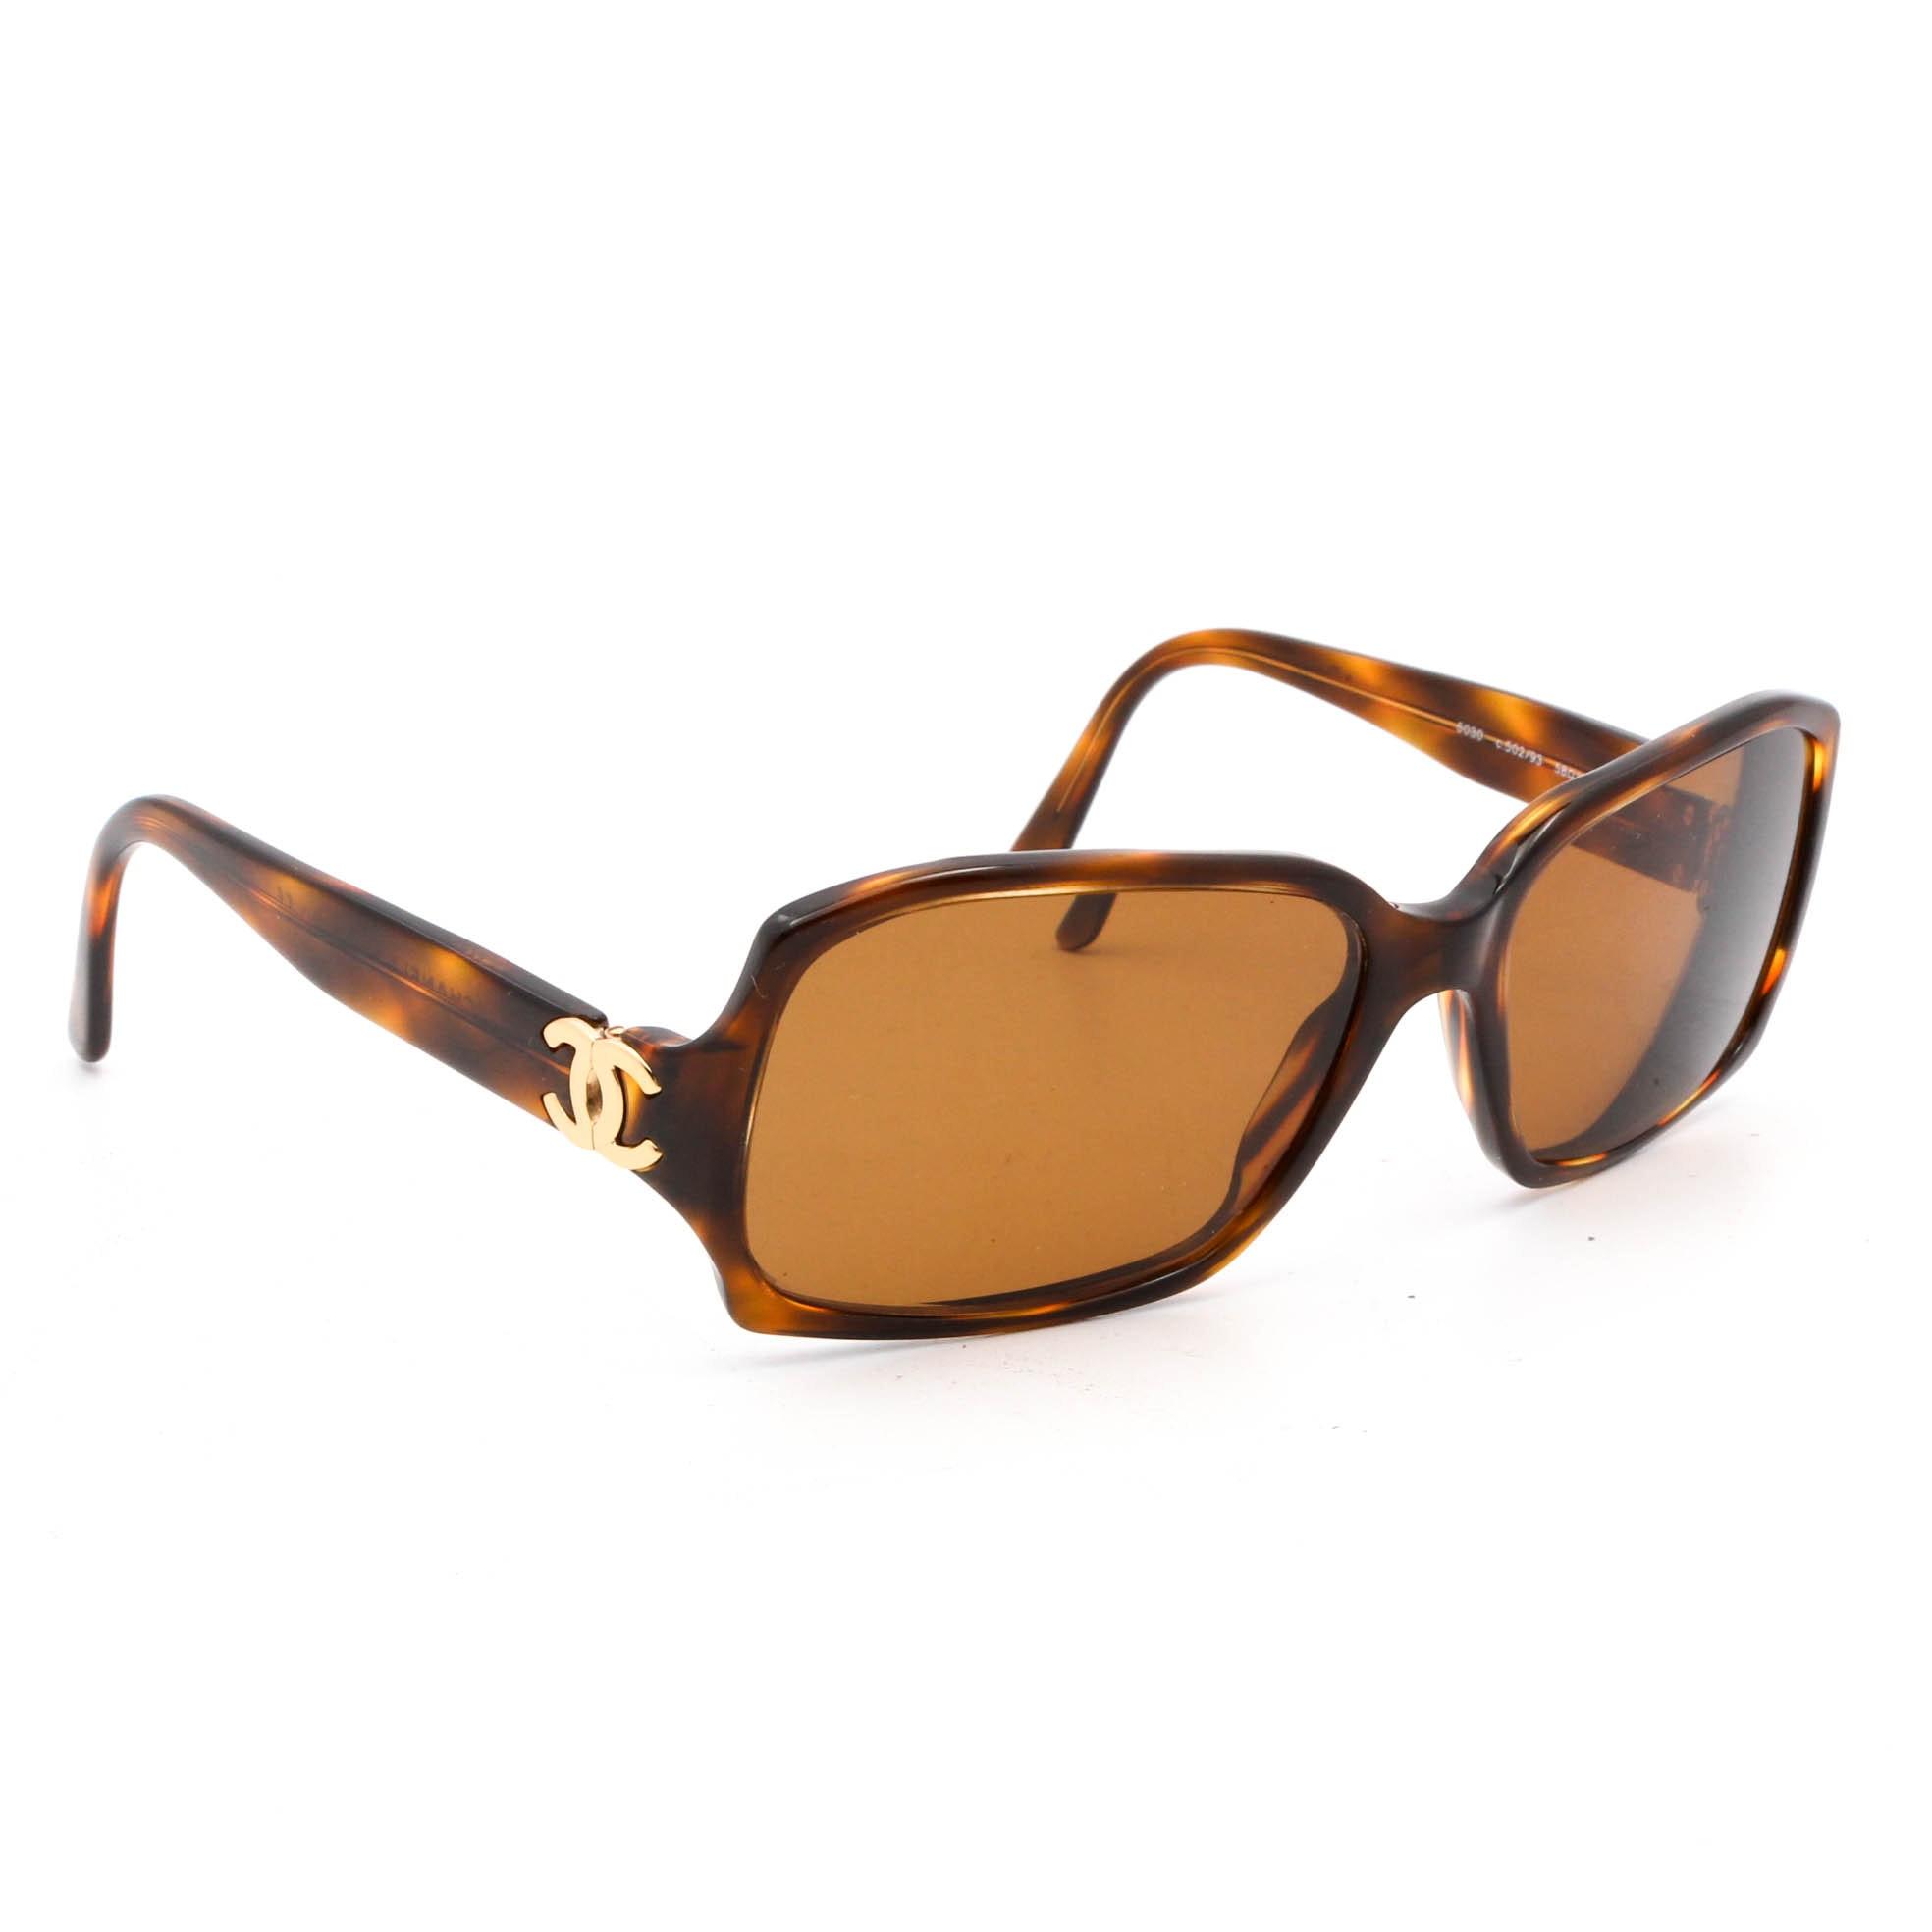 Chanel Tortoise Shell-Style Sunglasses